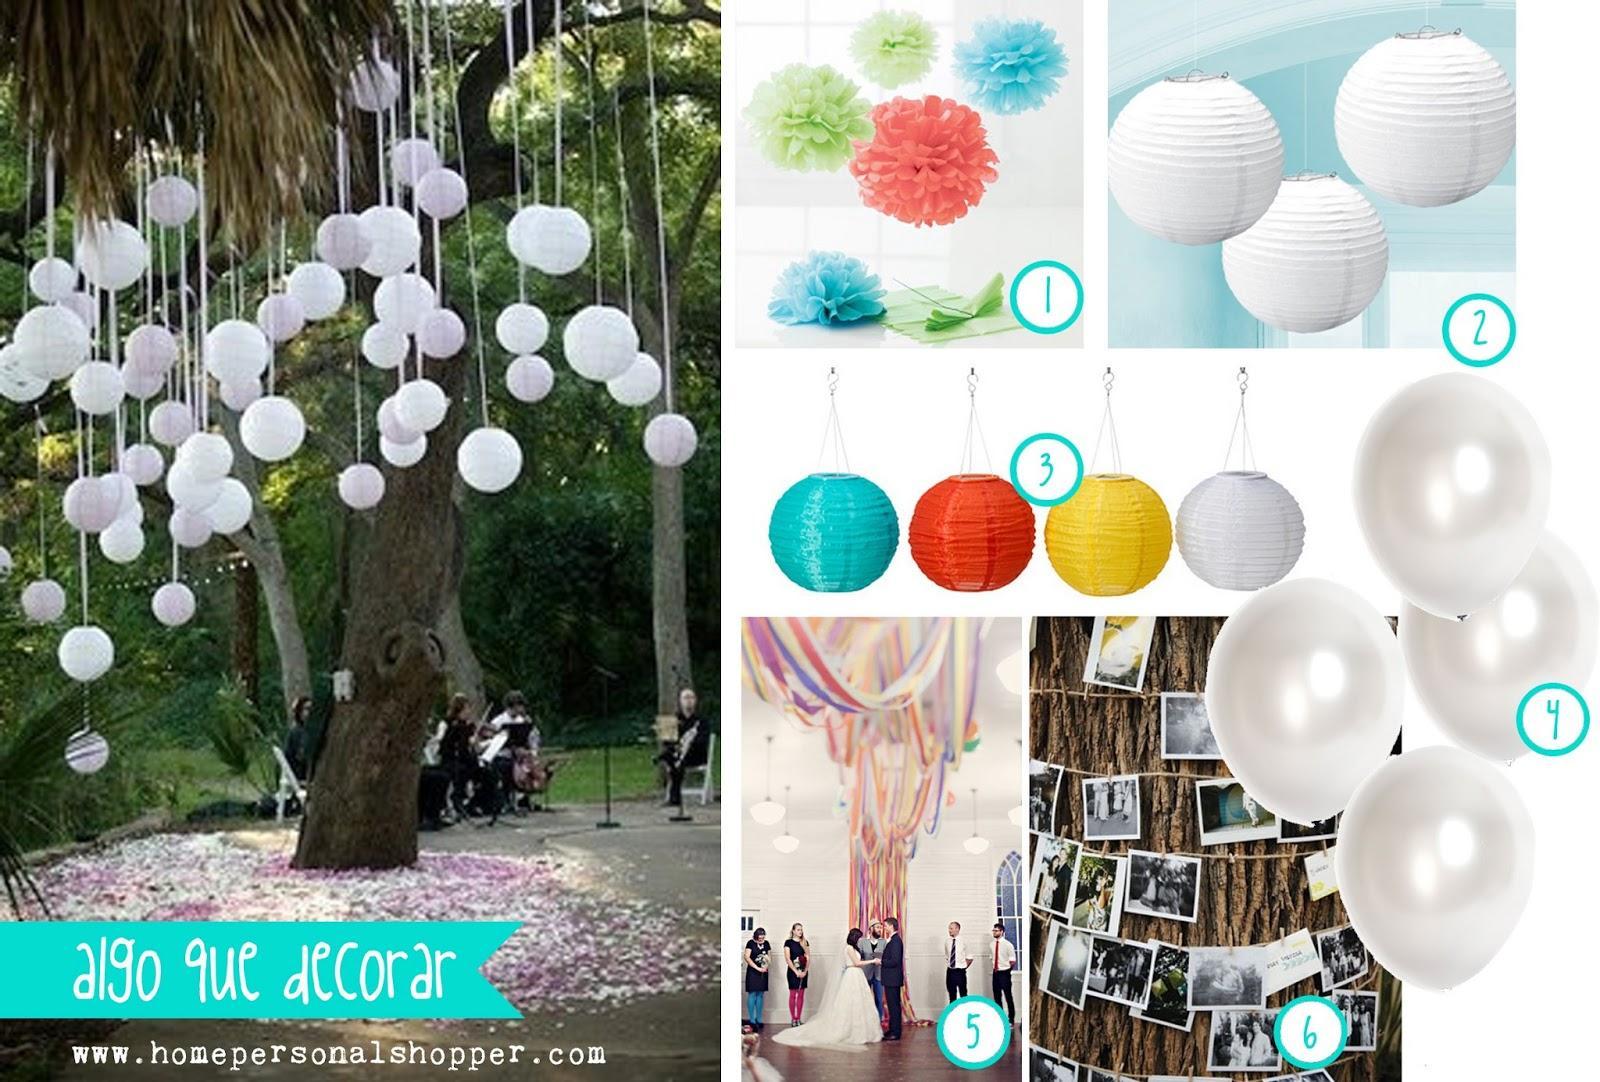 Detalles para tu boda paperblog - Detalles de decoracion ...